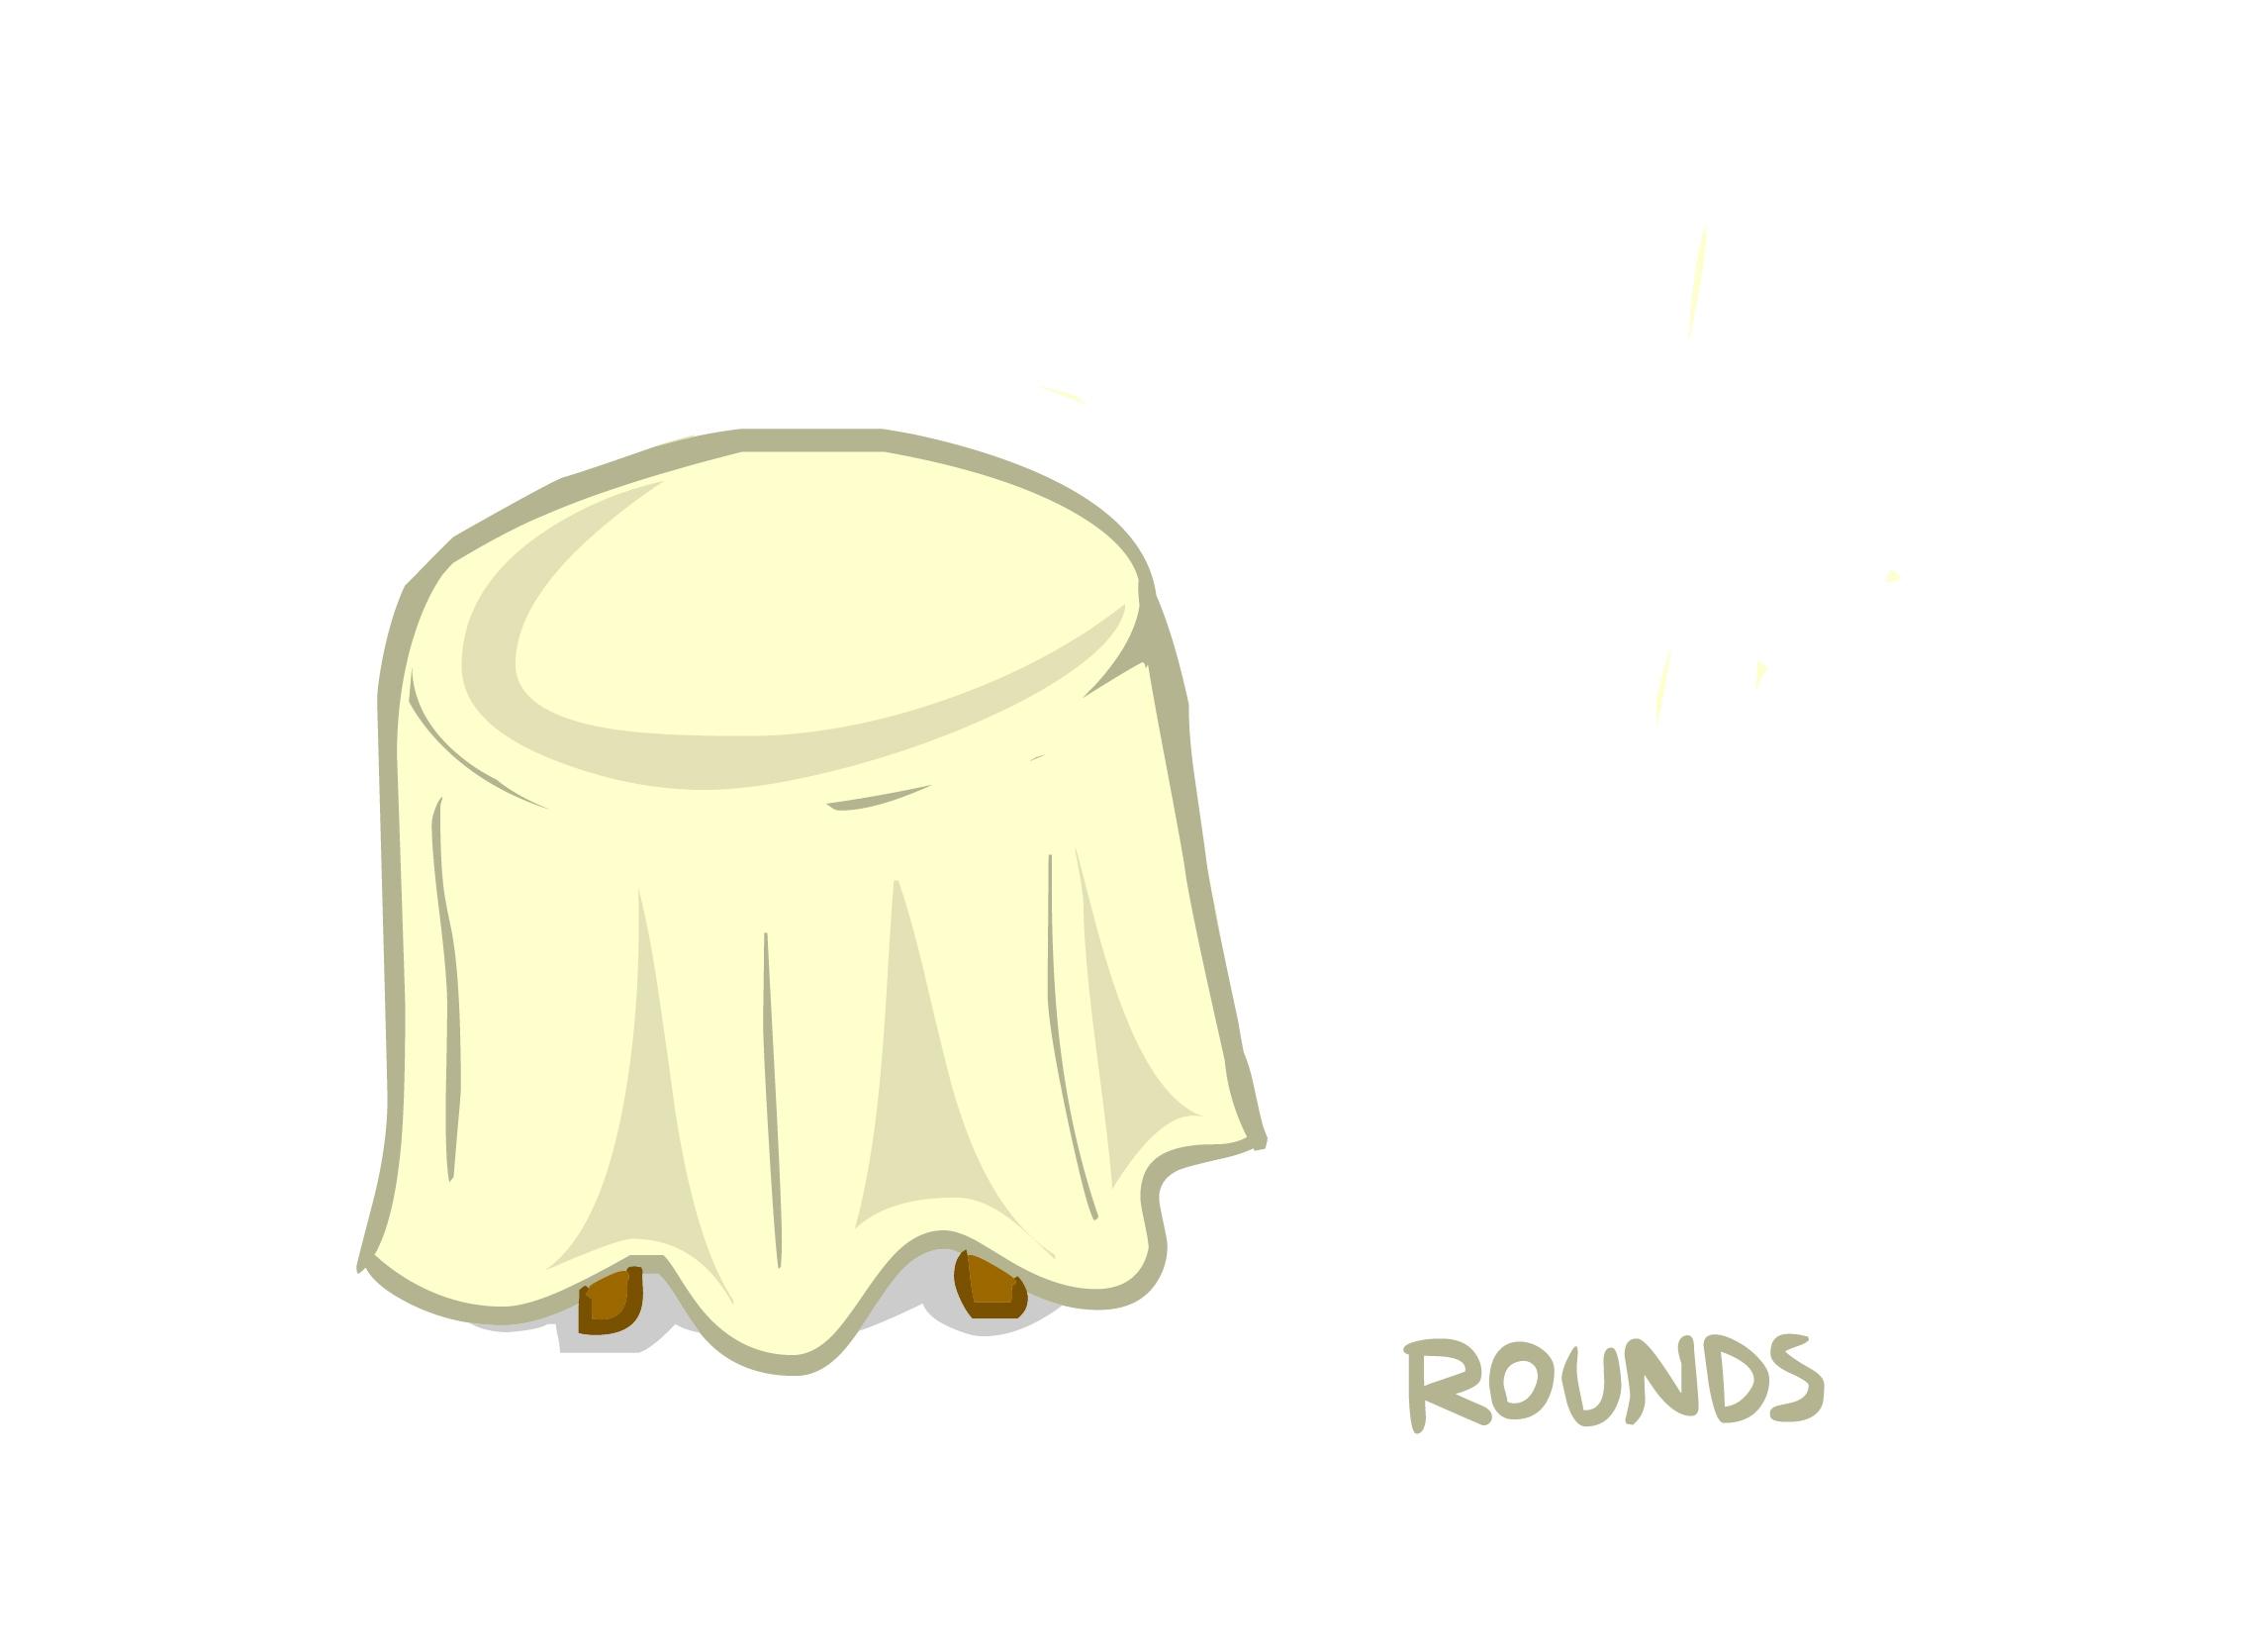 Tissue Lamé Round Tablecloths 01345